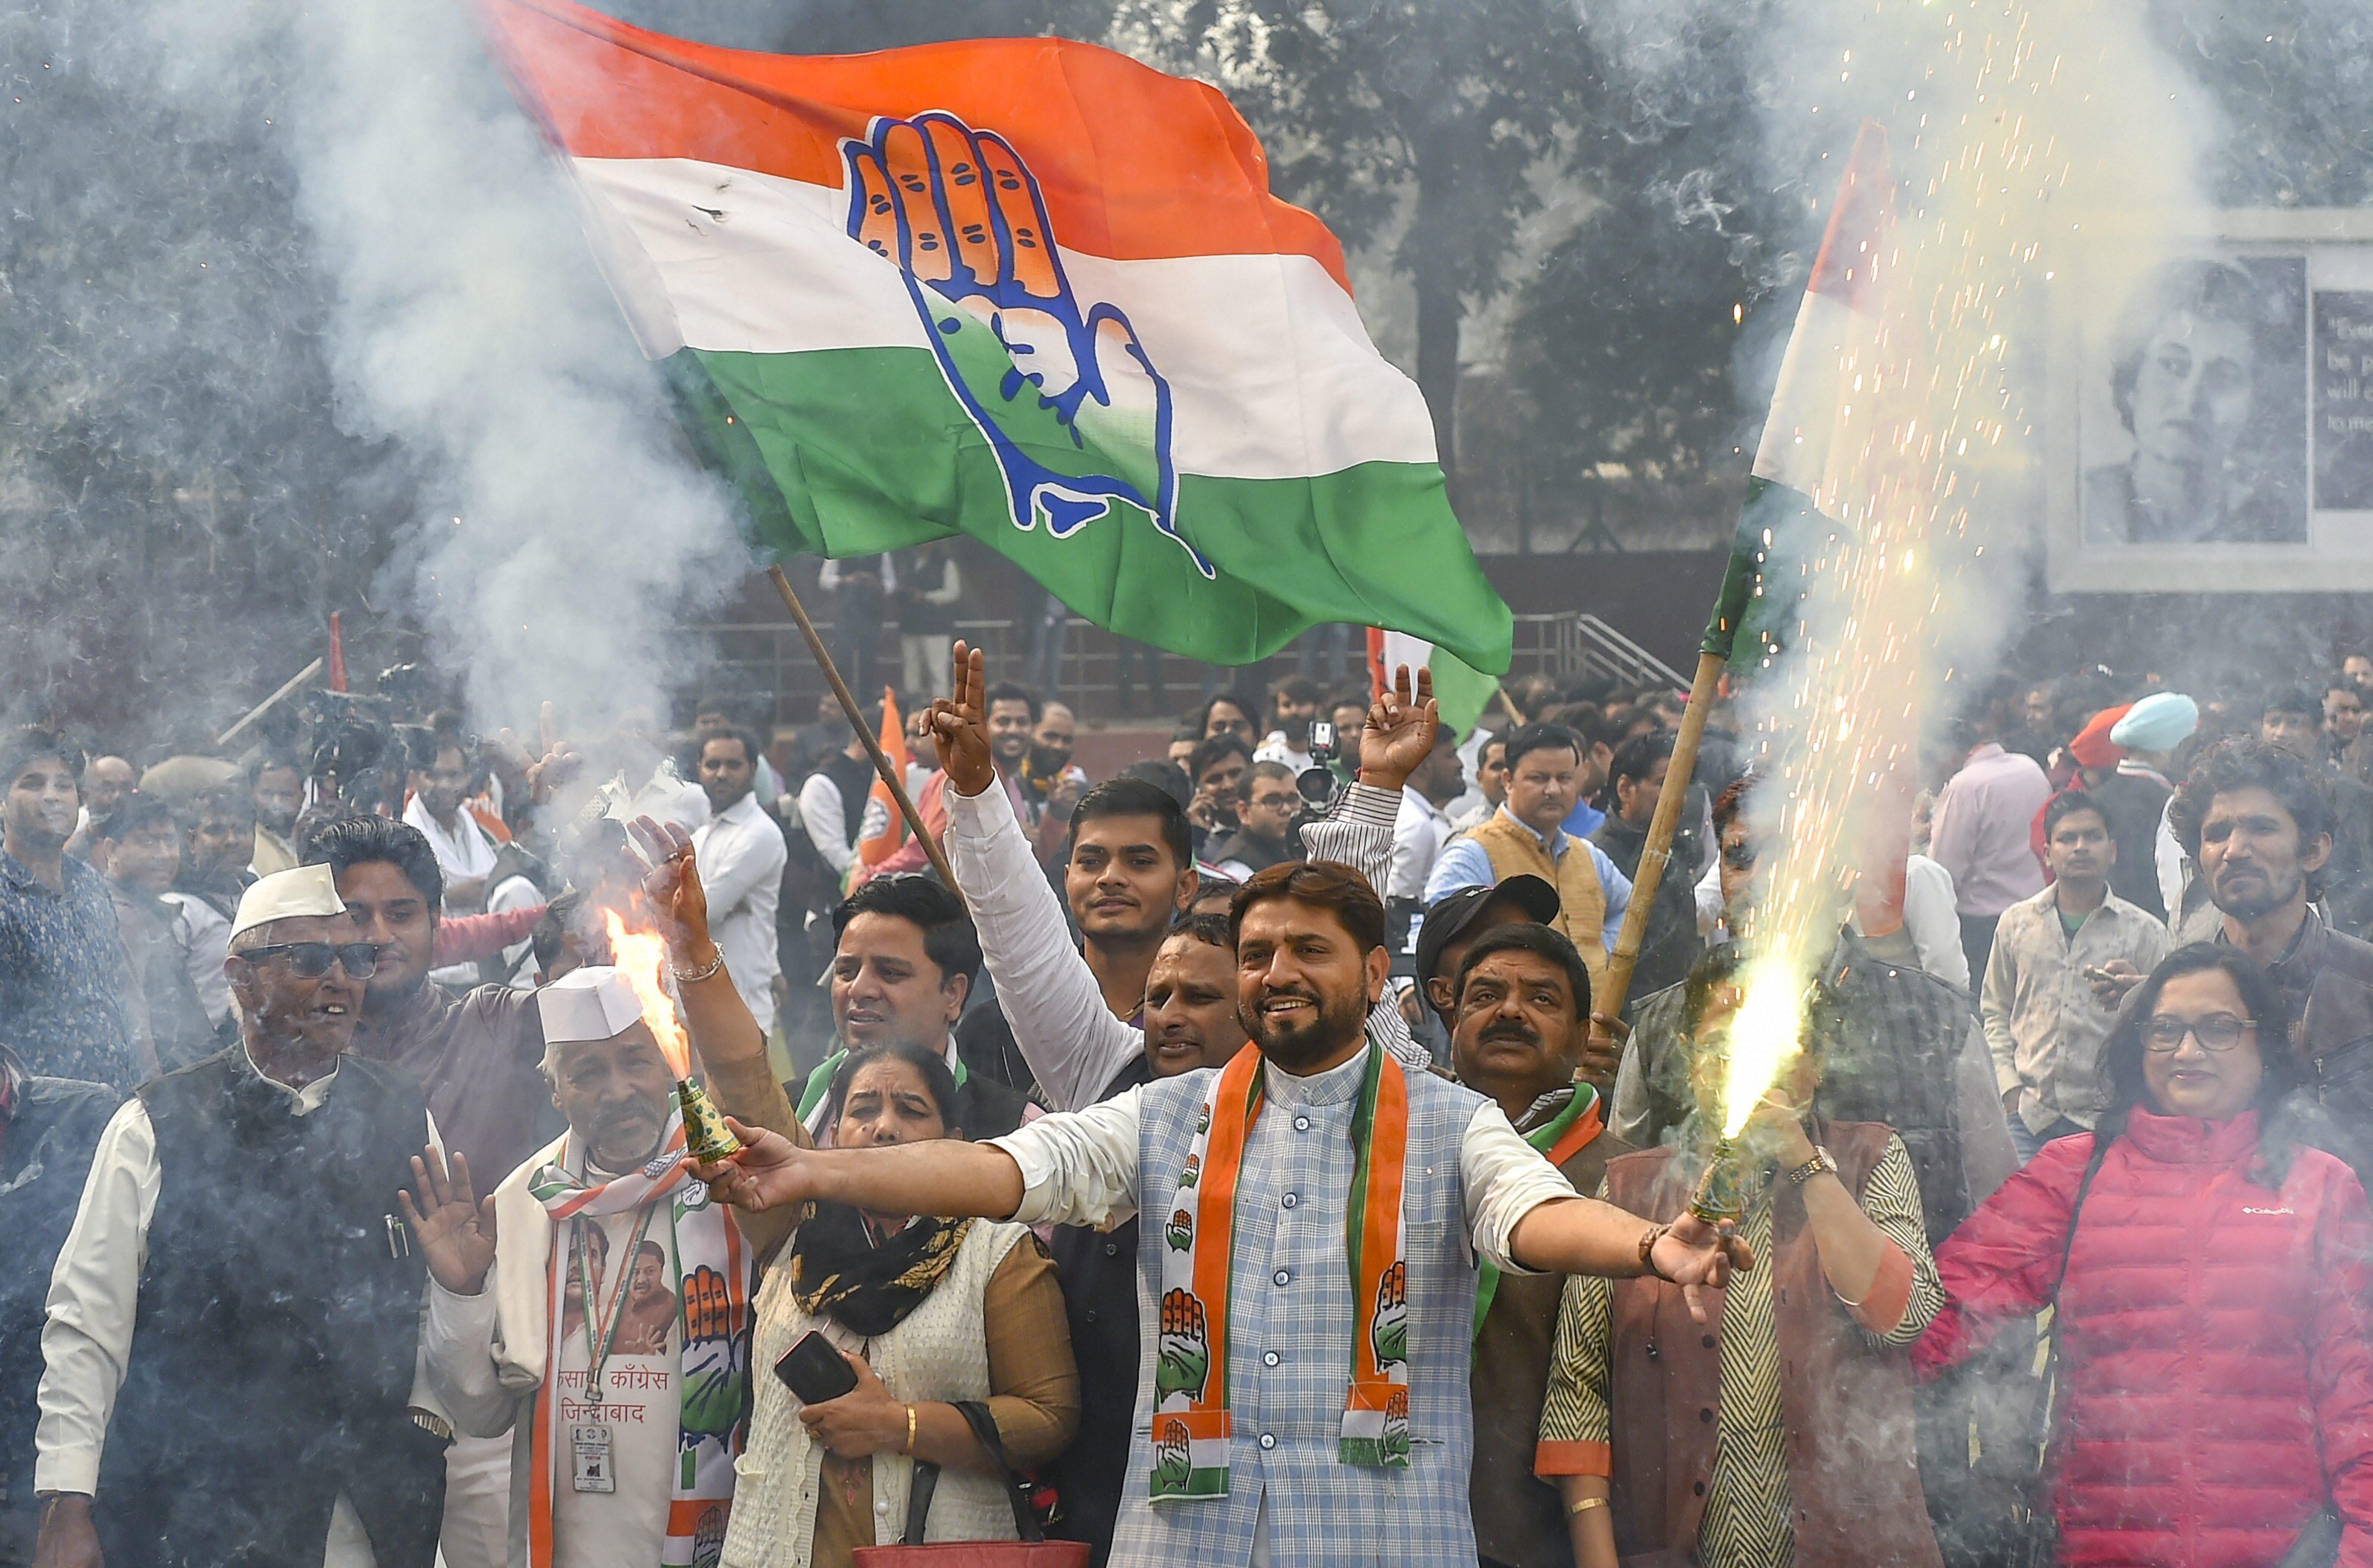 BJP and allies should introspect: Shiv Sena